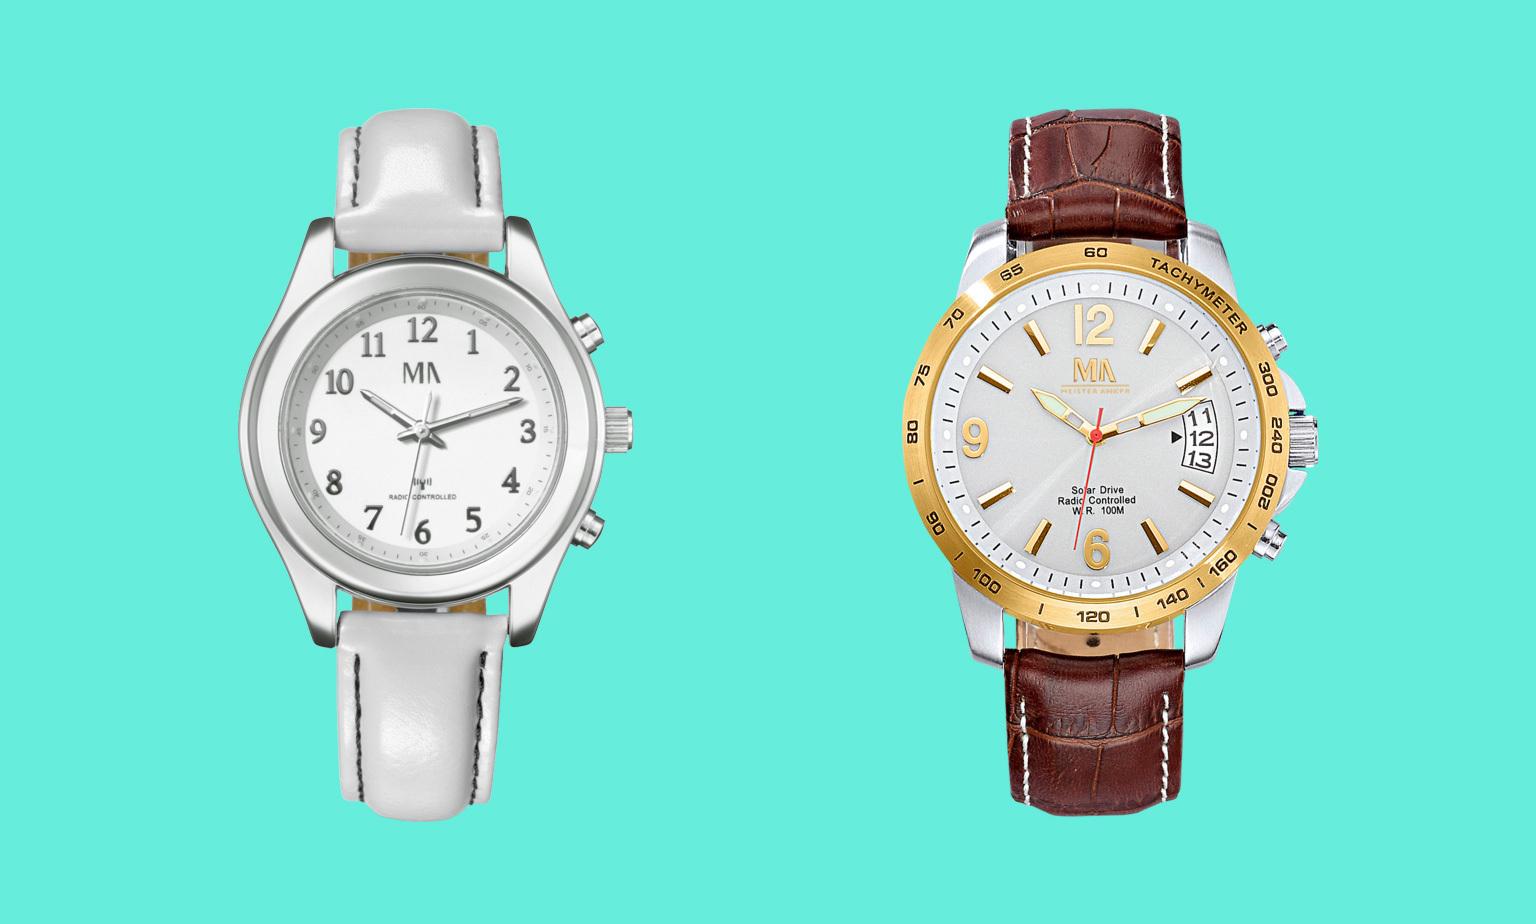 Armbanduhren bis zu 50%* reduziert